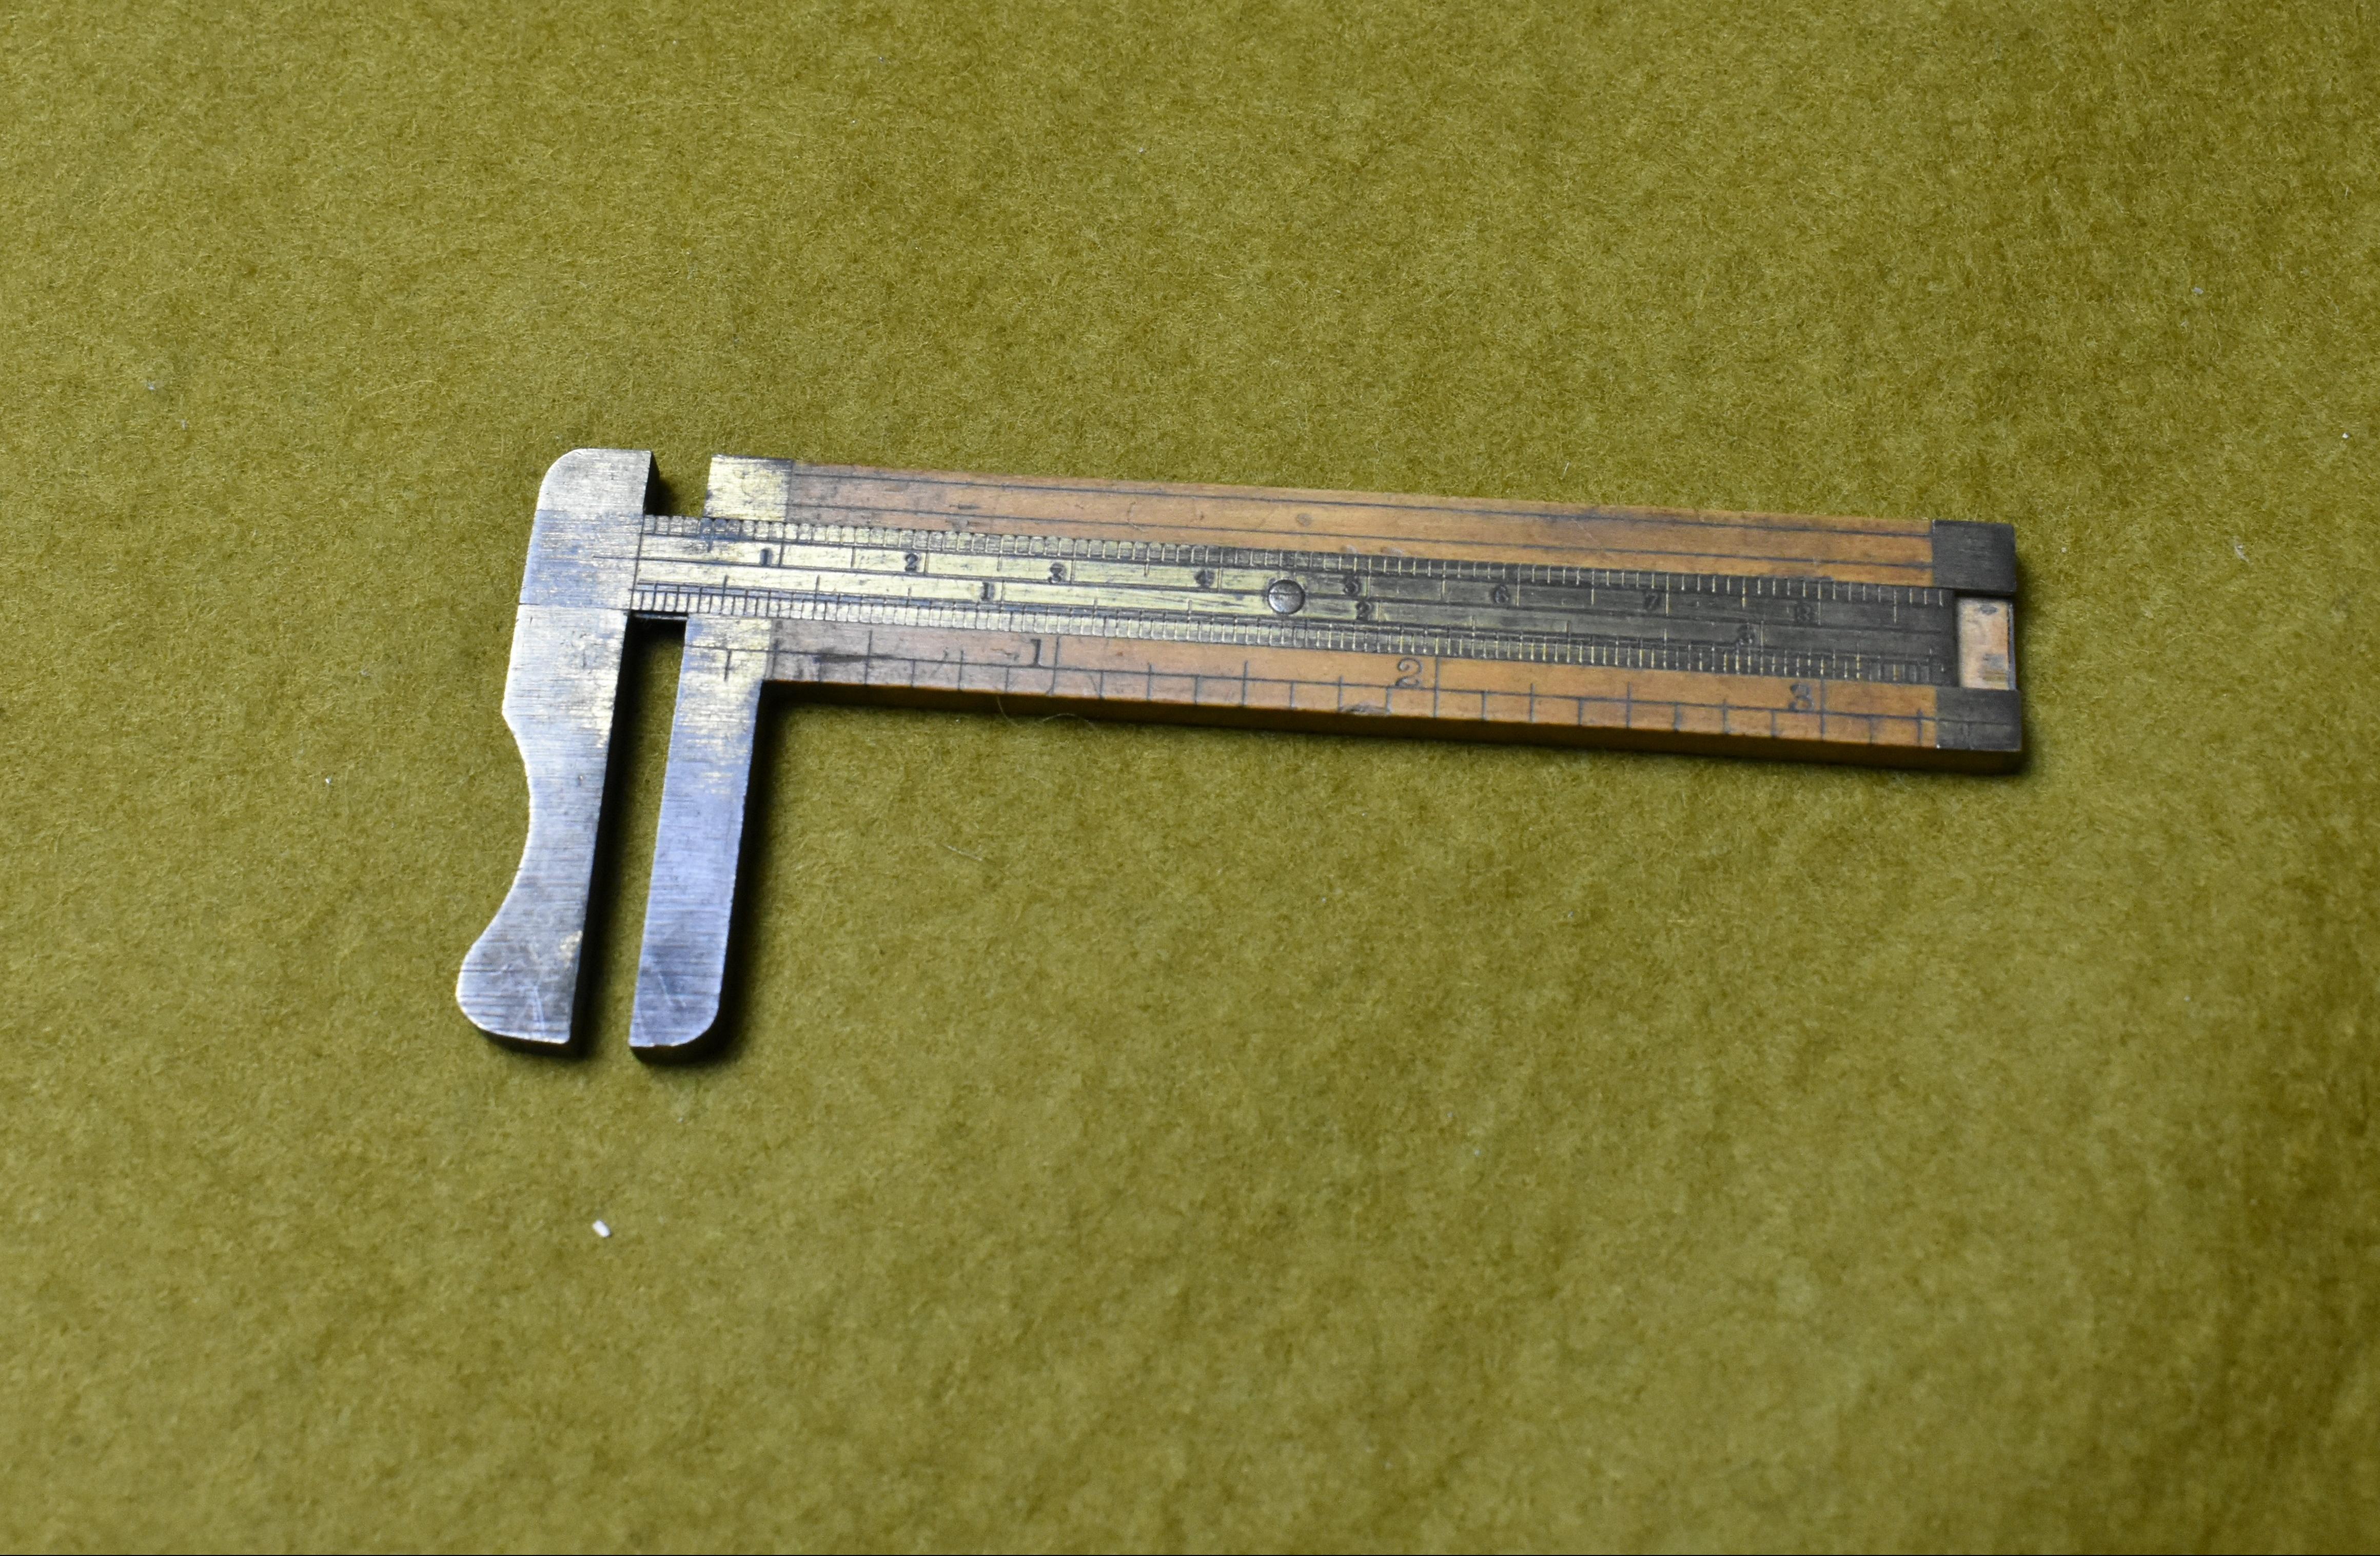 "3.1/2"" Calliper rule marked Henry Howell & Co., Stick Mftrs. London"